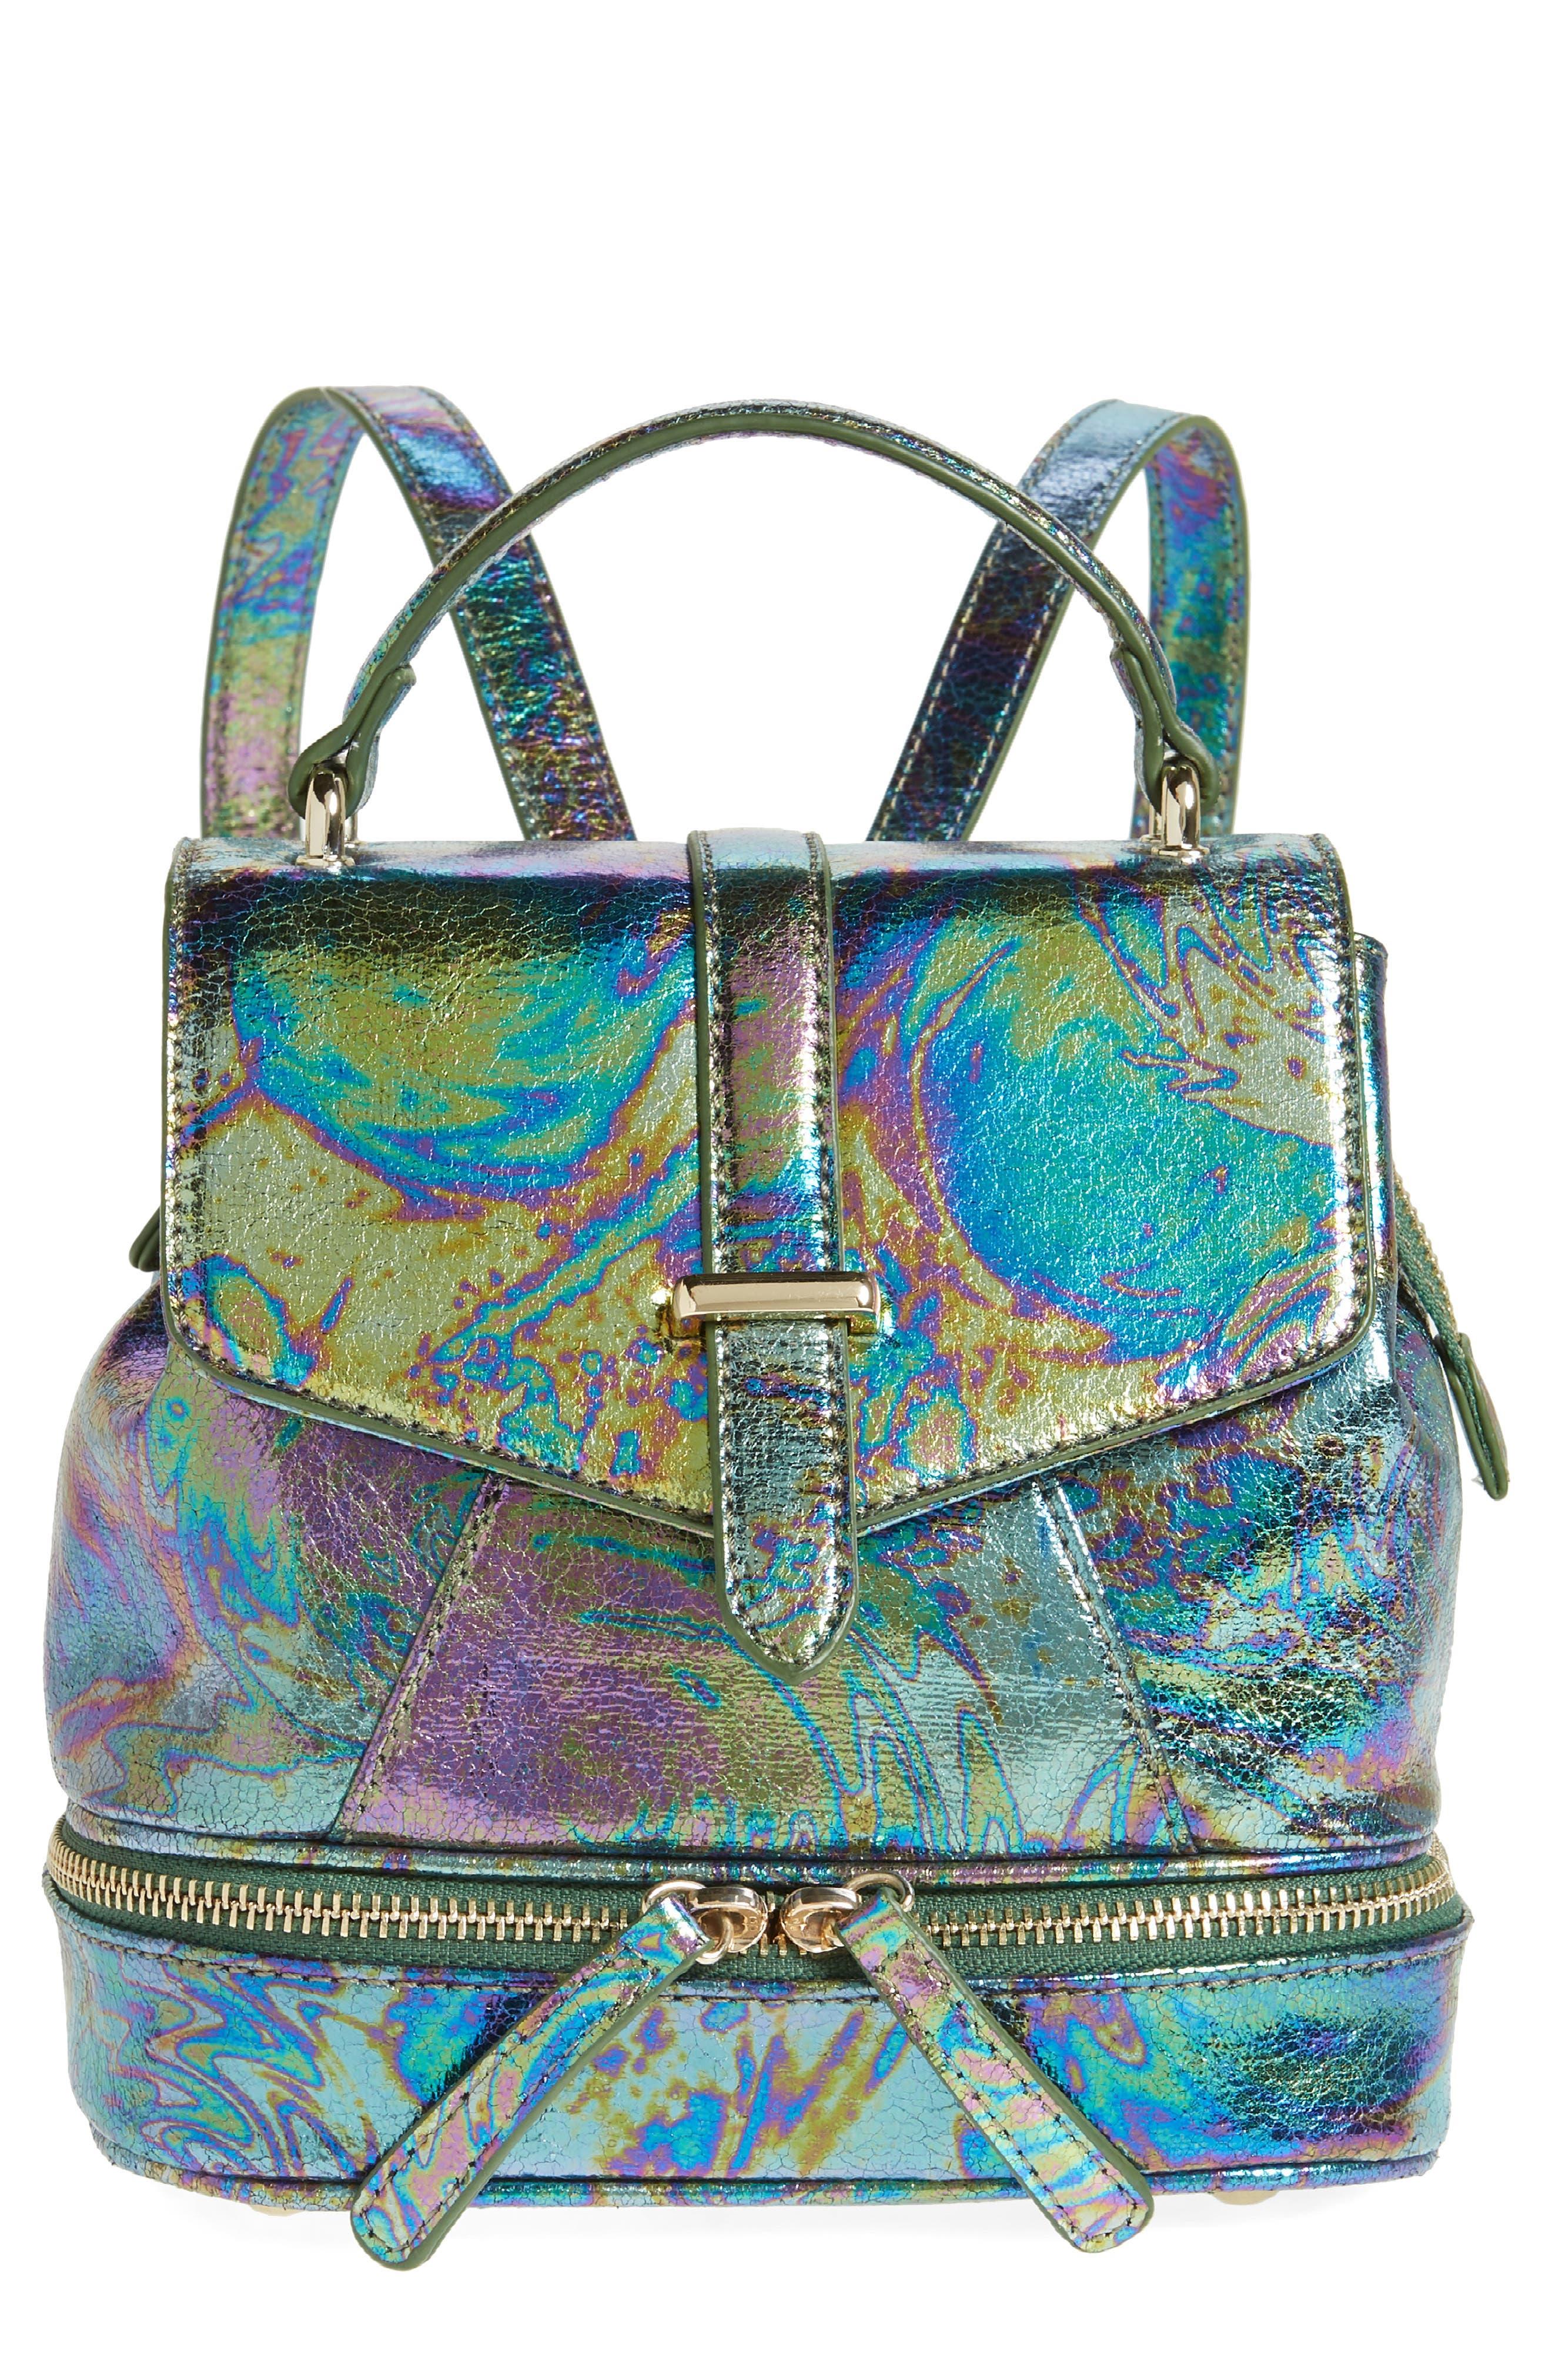 Mailbu Skye Oil Slick Faux Leather Backpack - Blue